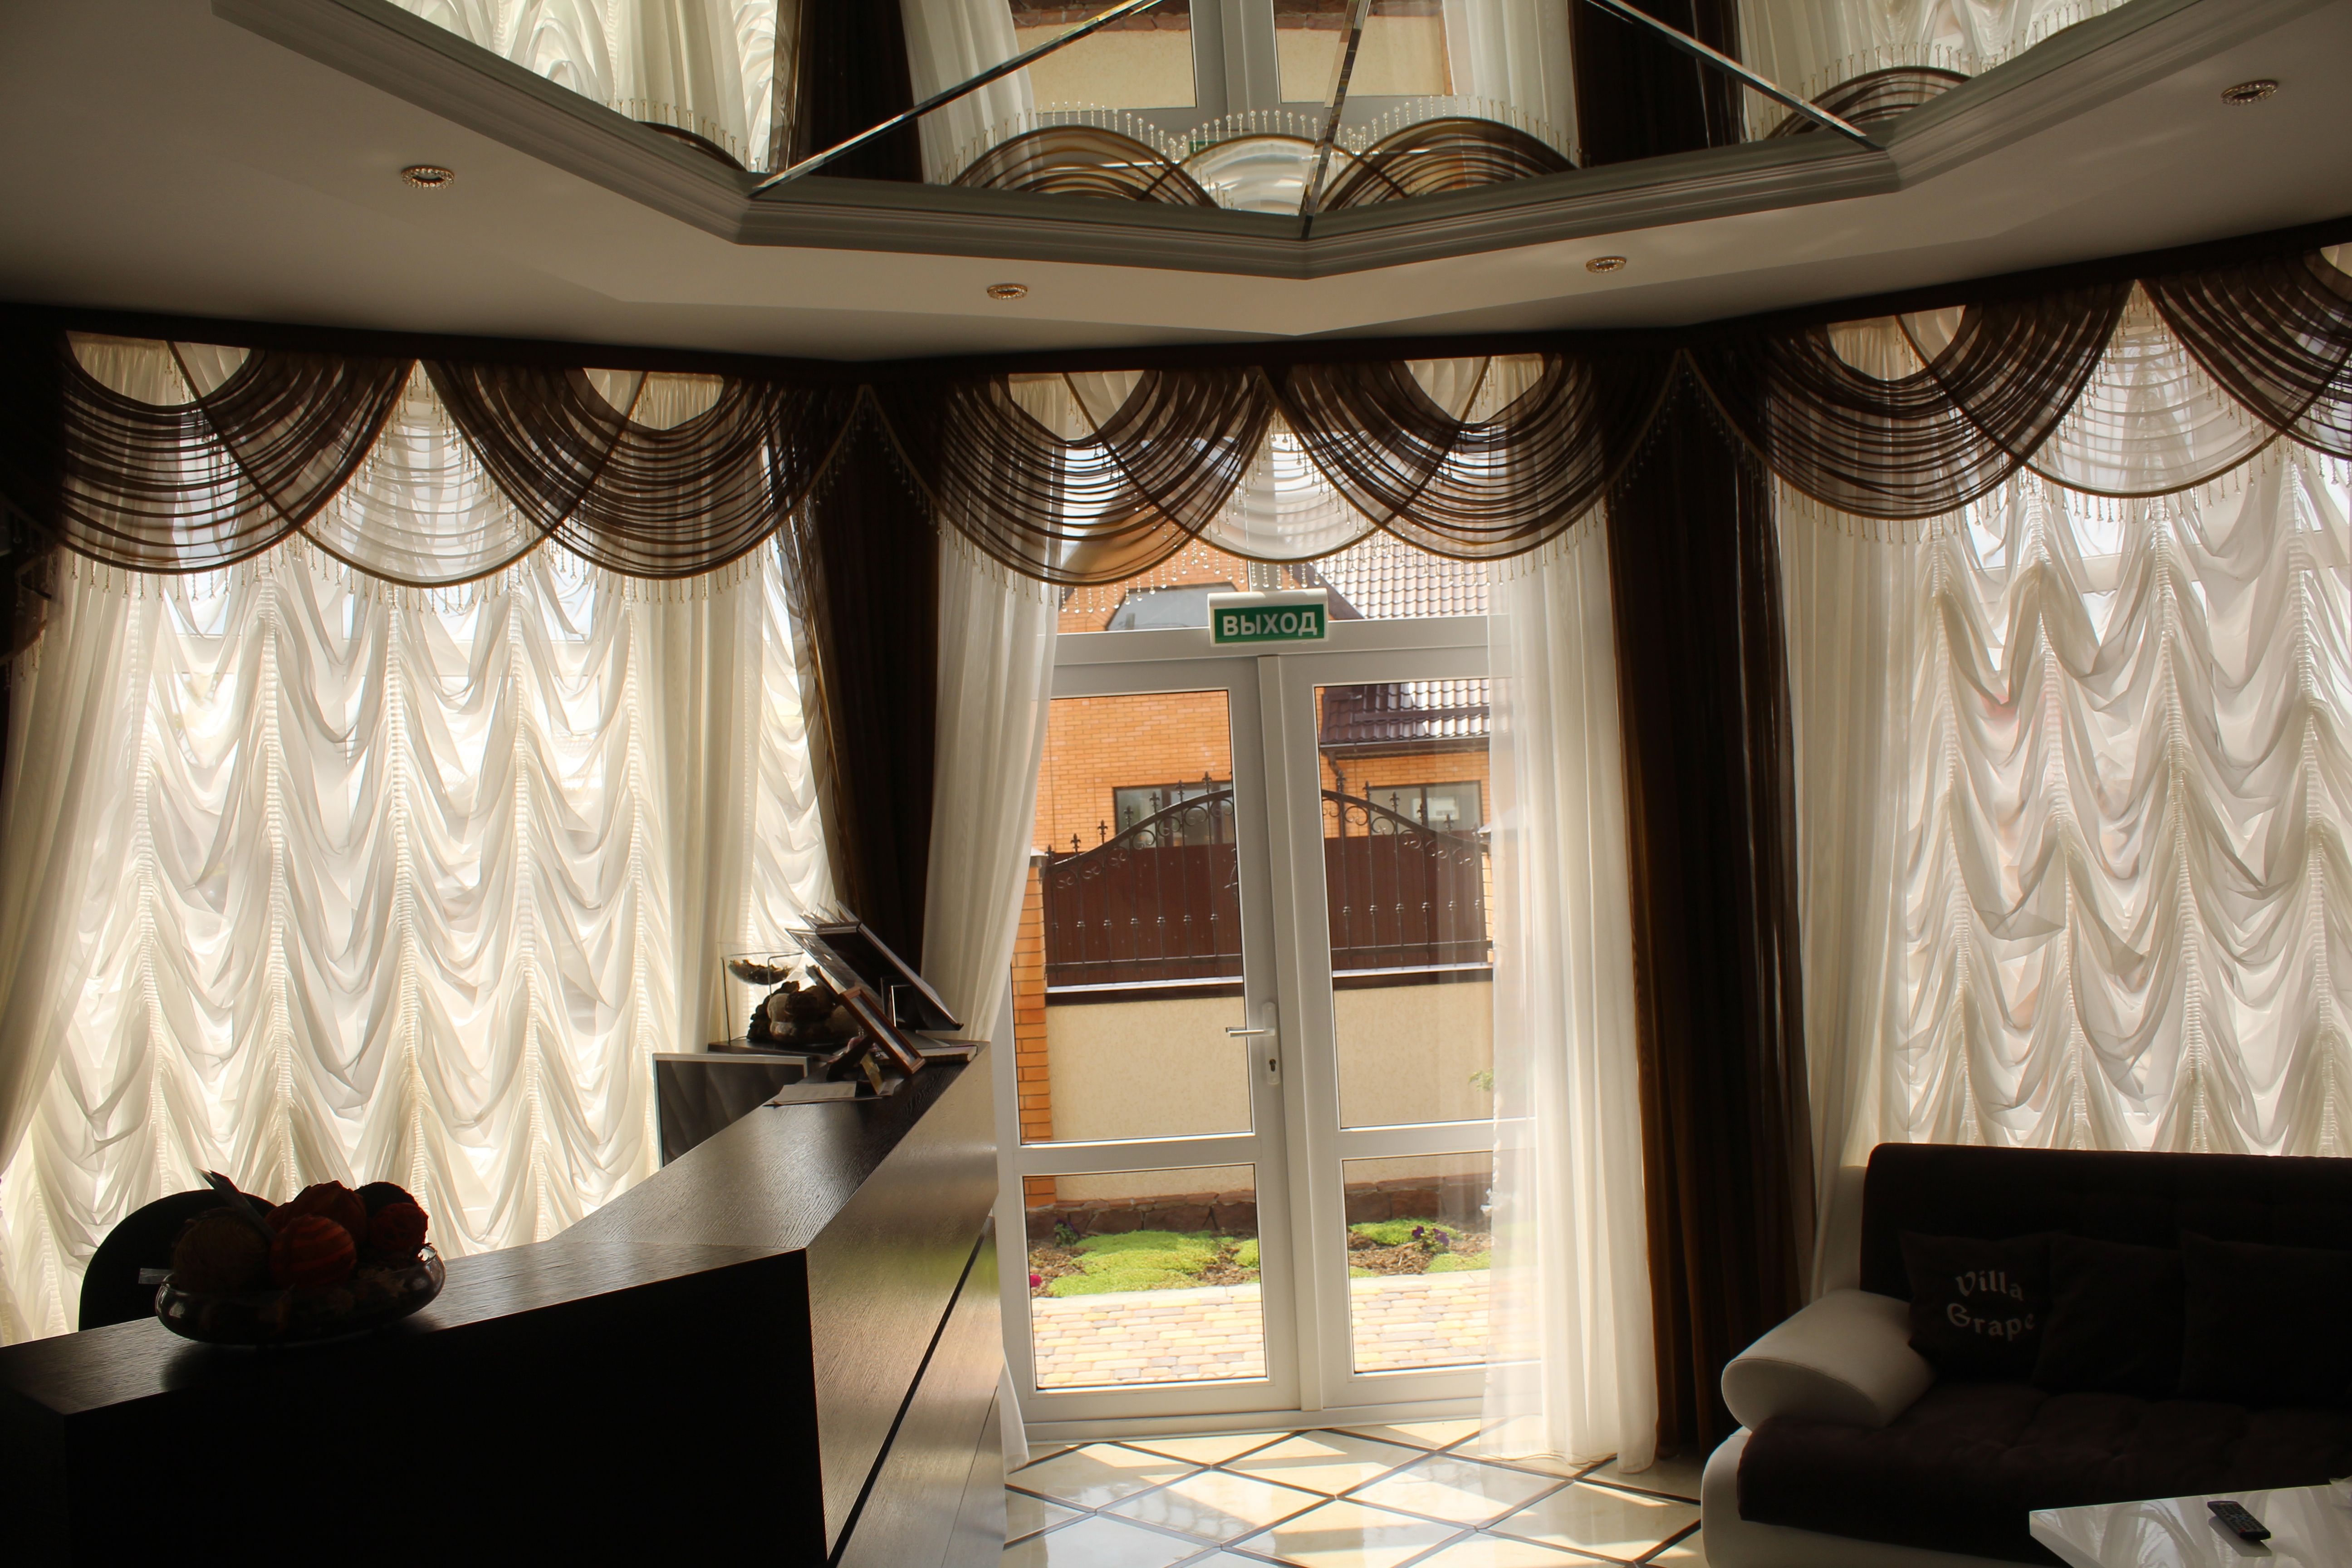 IMГостевой дом VillaGrapeG_1360